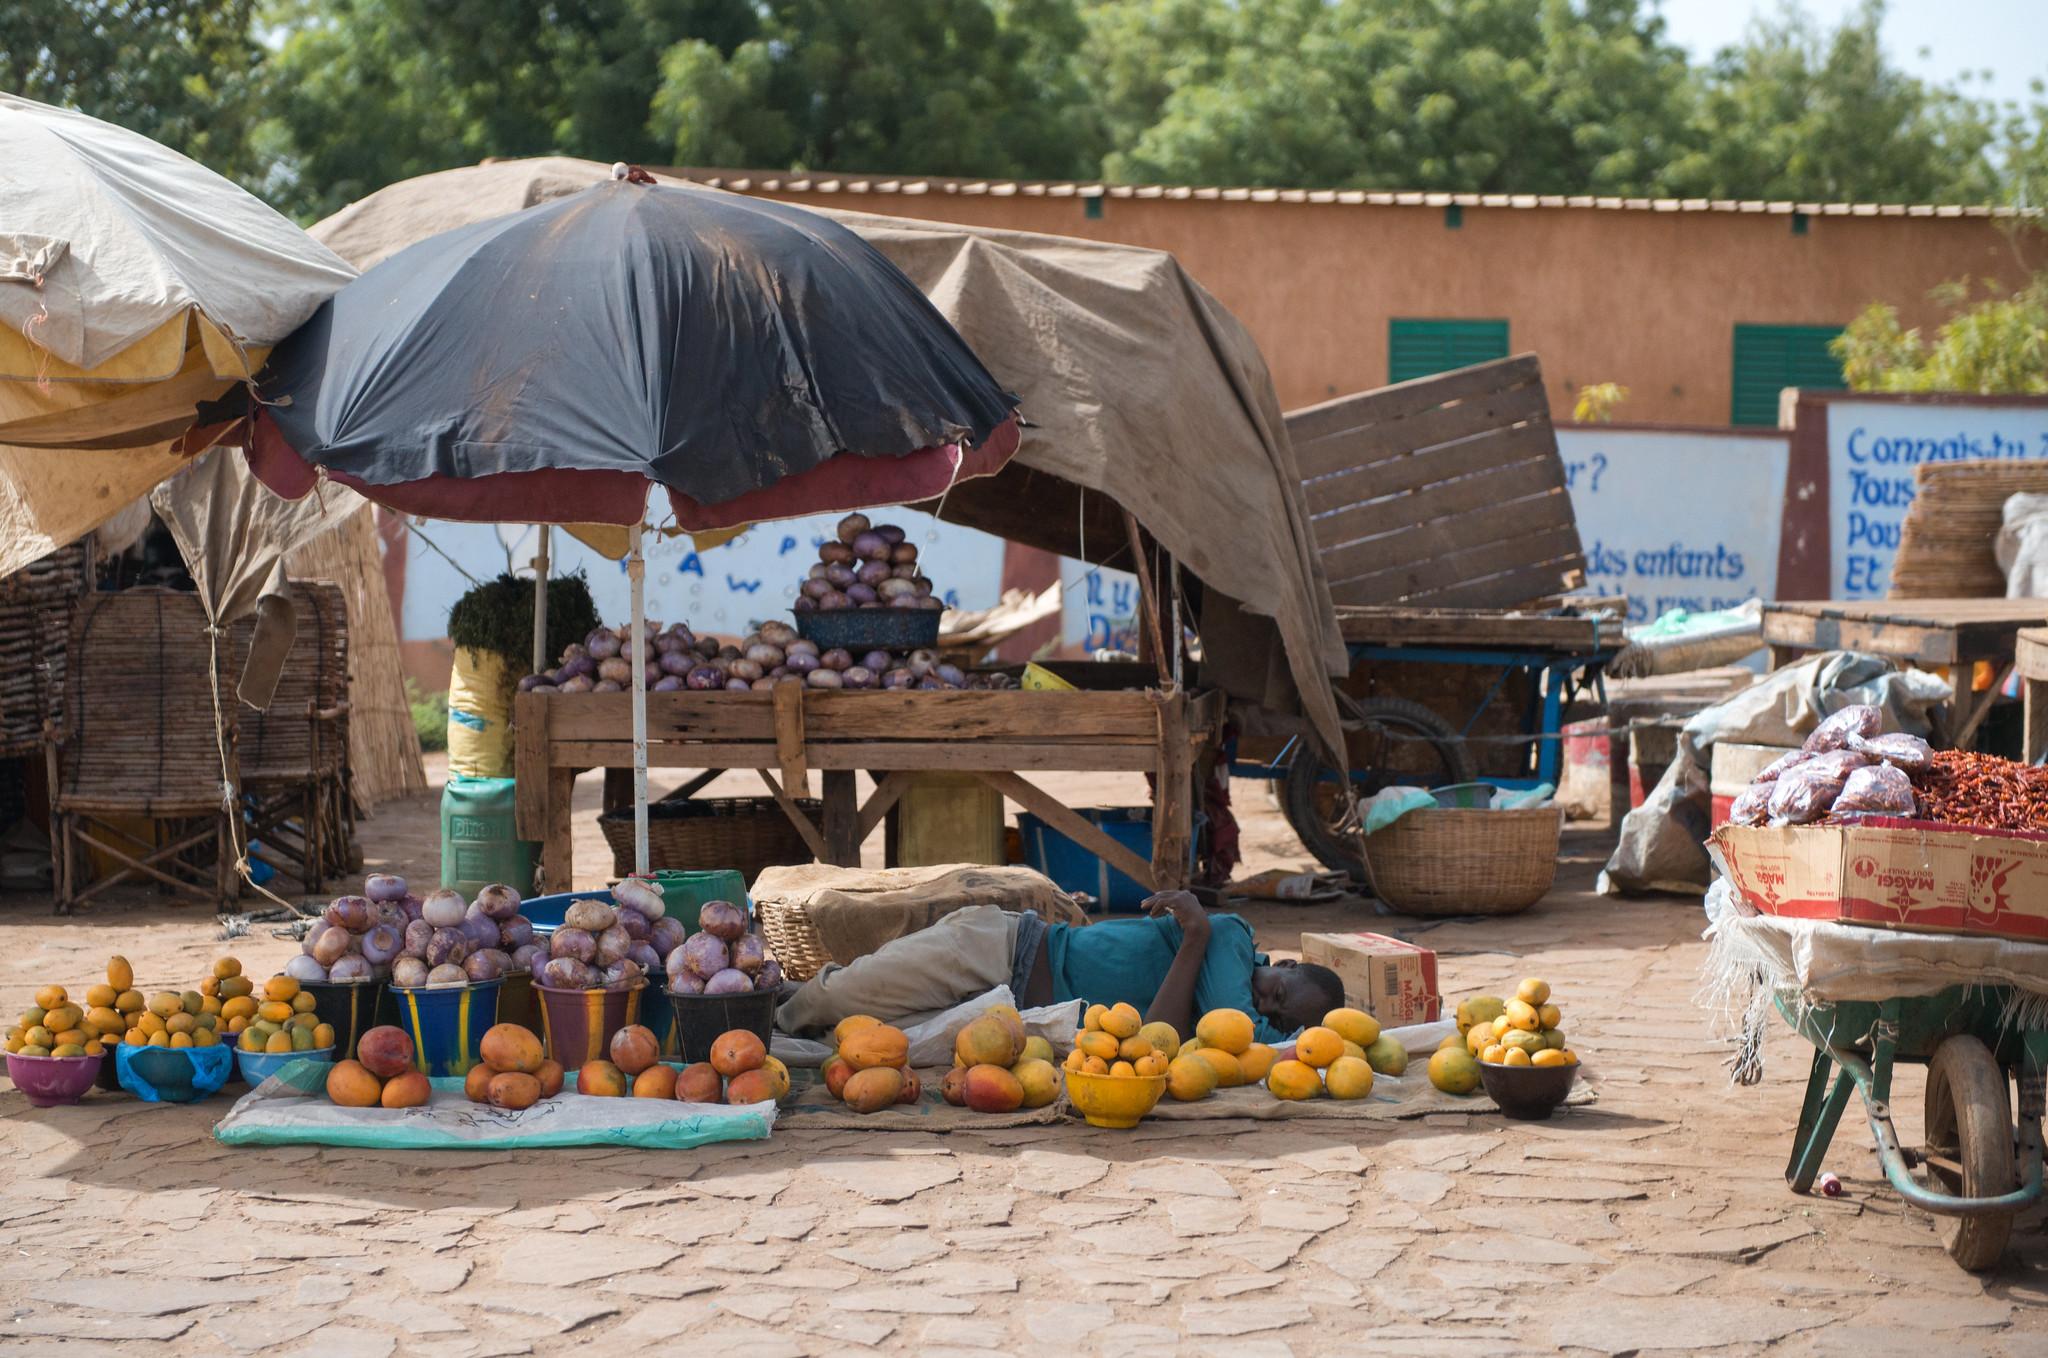 Sleeping Vendor